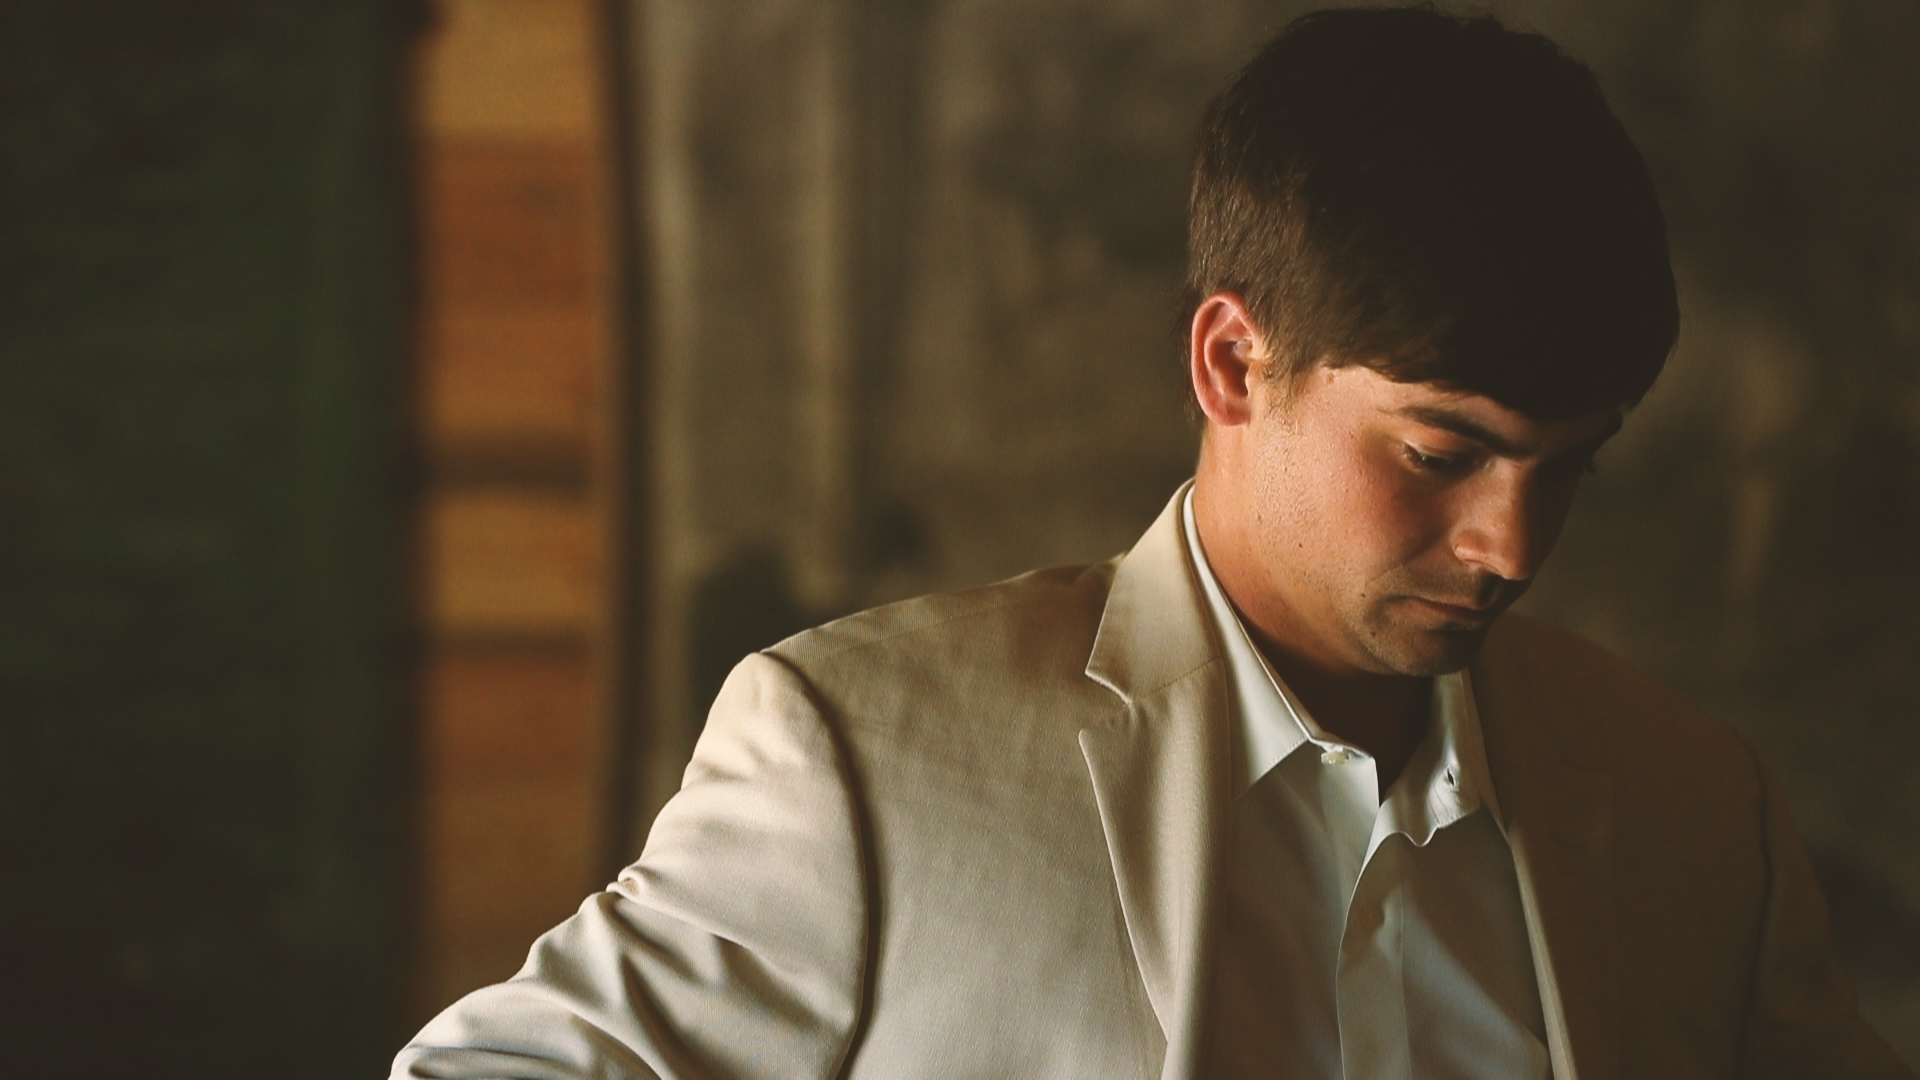 Groom Wedding - Bride Film